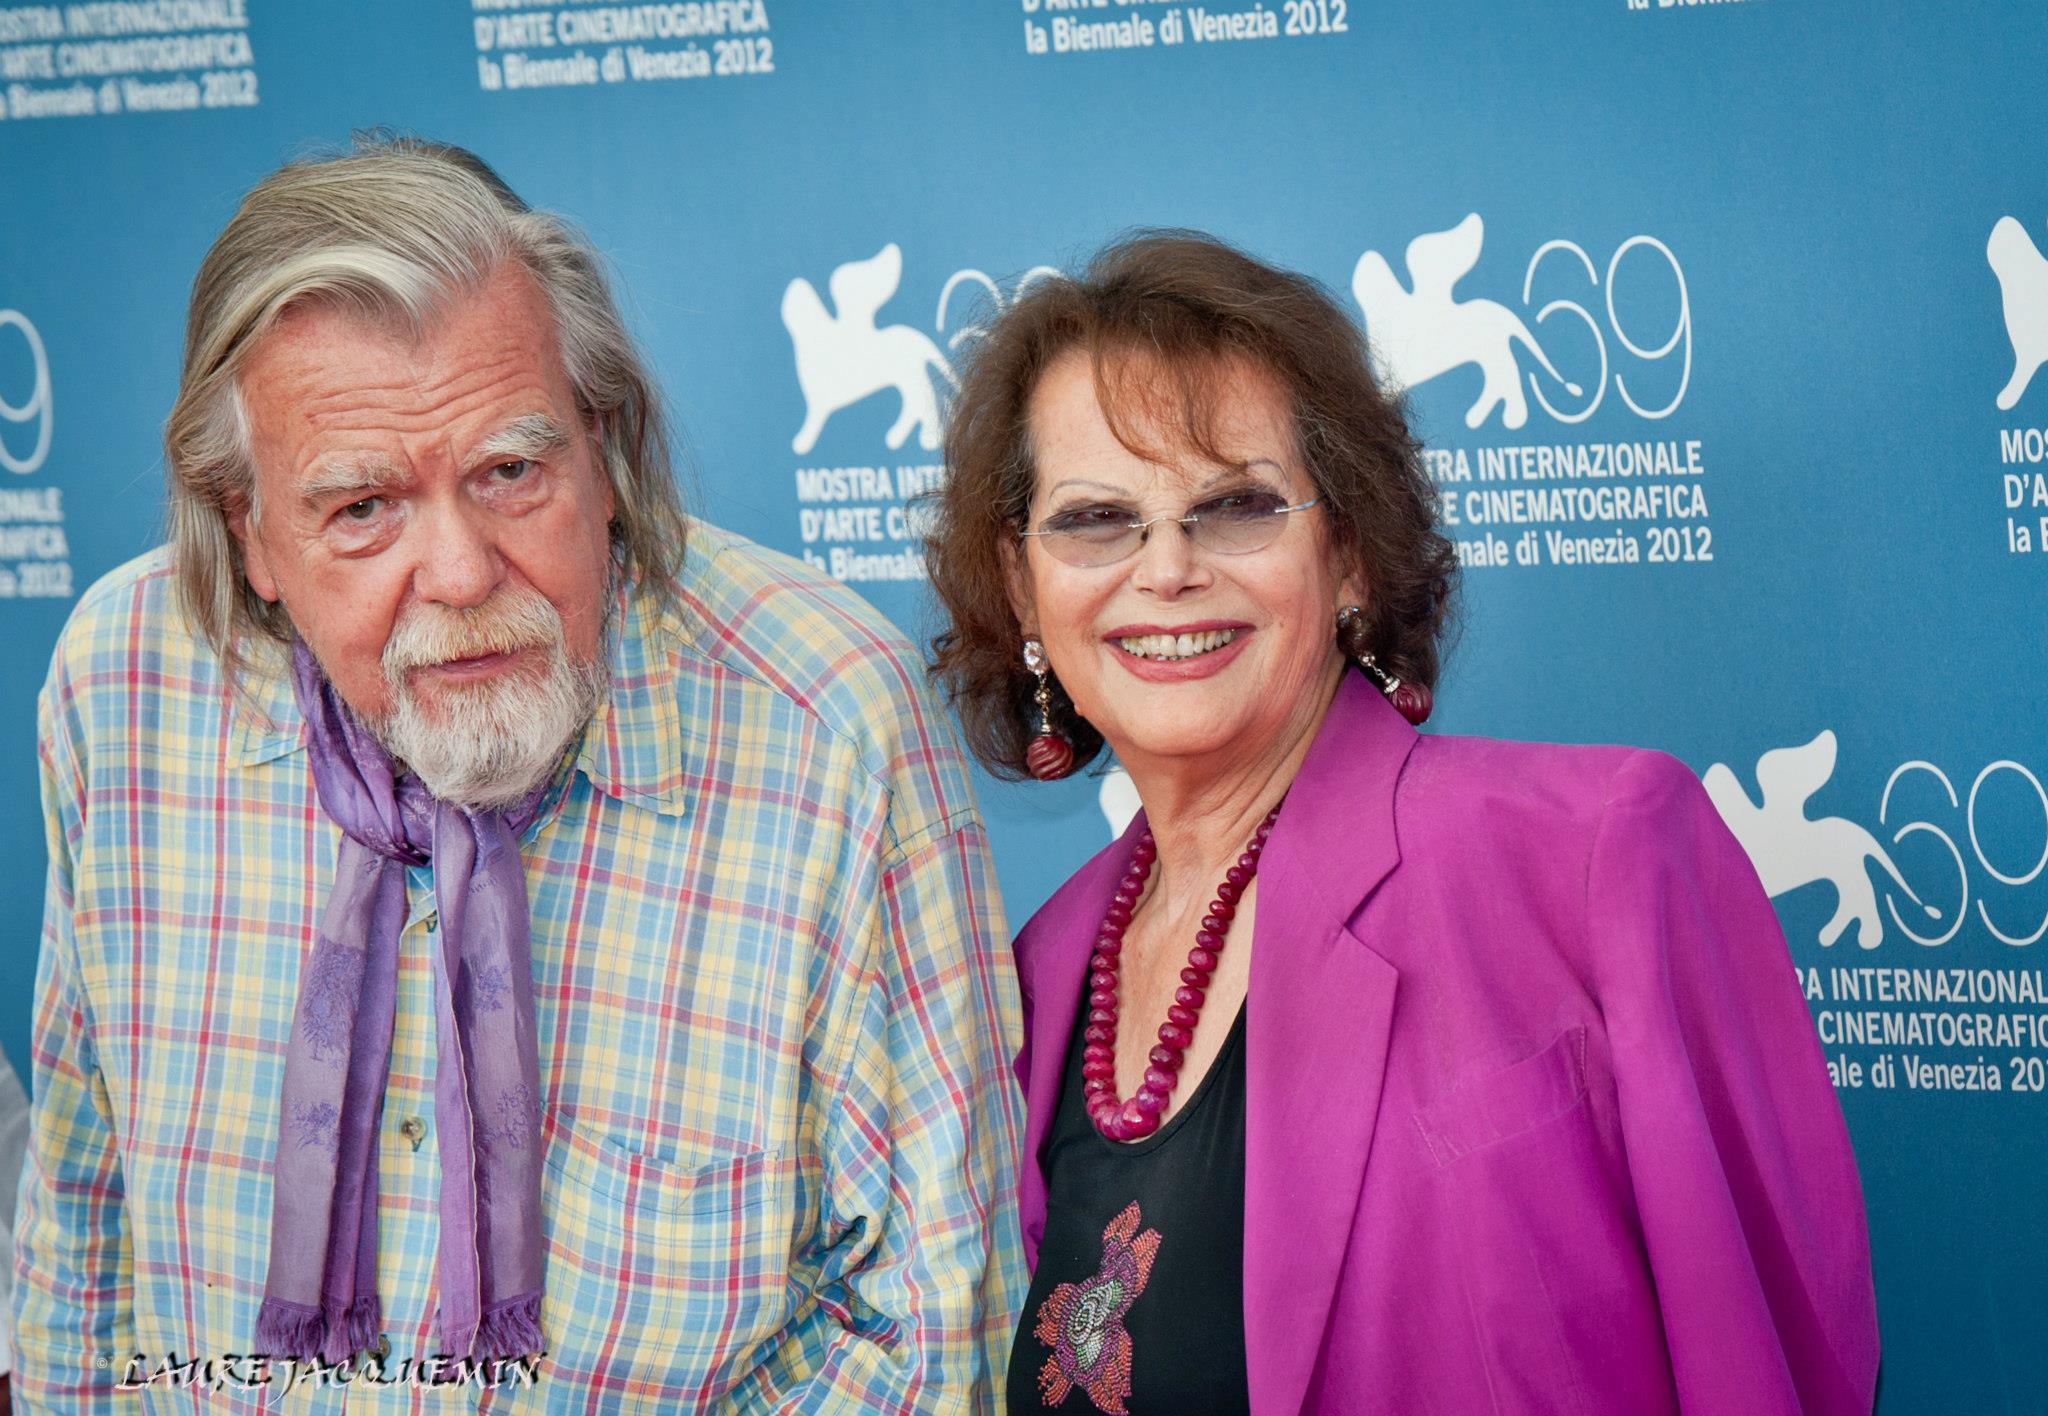 venice film festival venice laure jacquemin (79).jpg